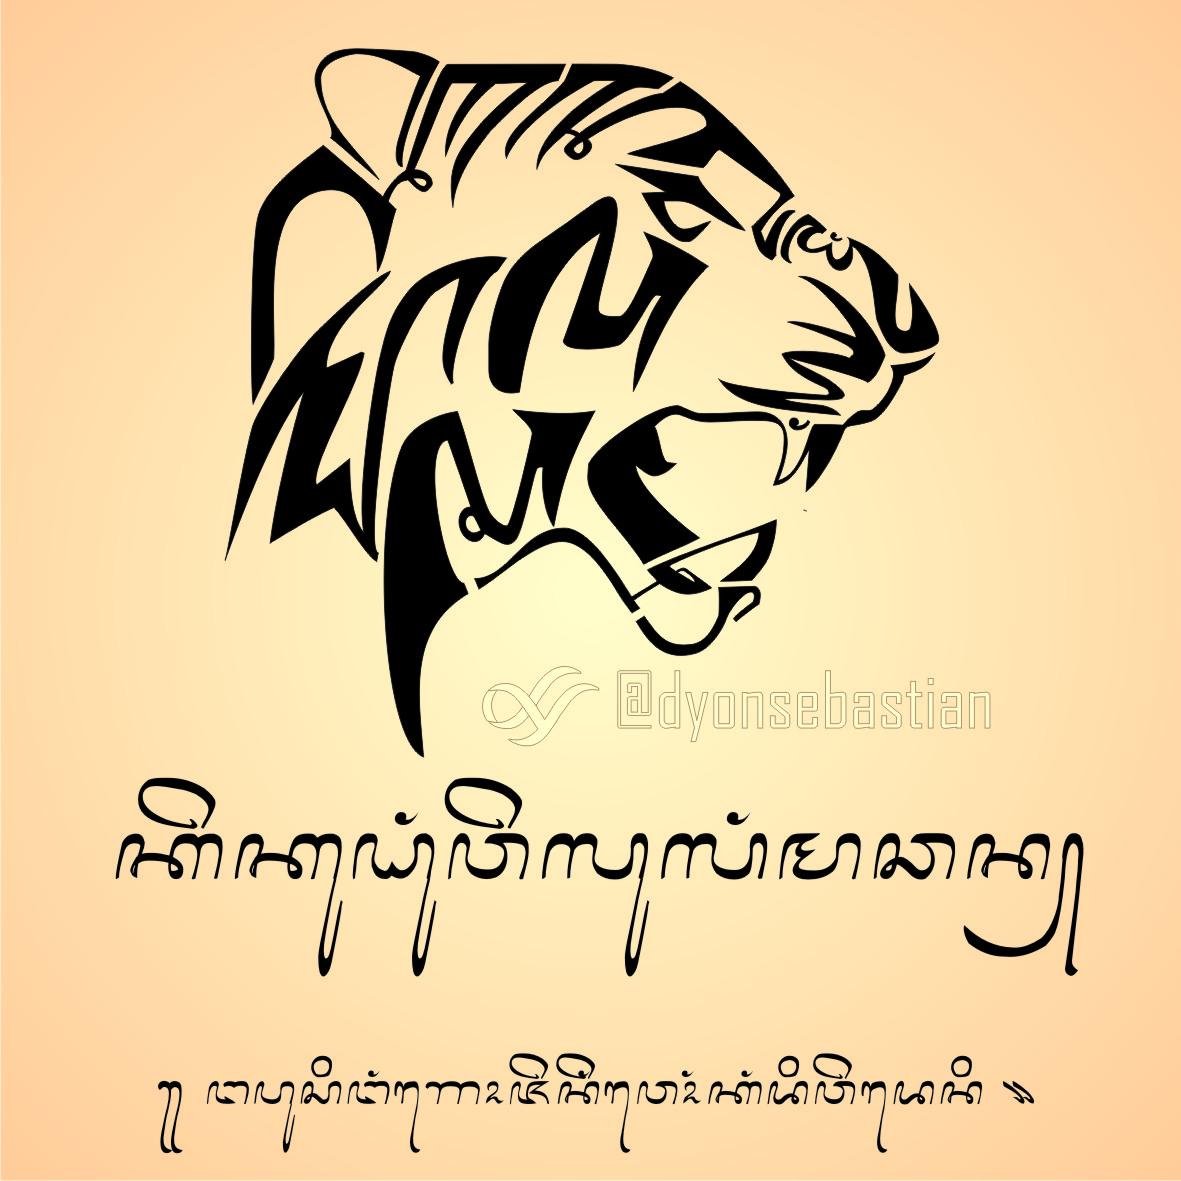 Gambar Kaligrafi Bahasa Jawa Beserta Artinya Nusagates